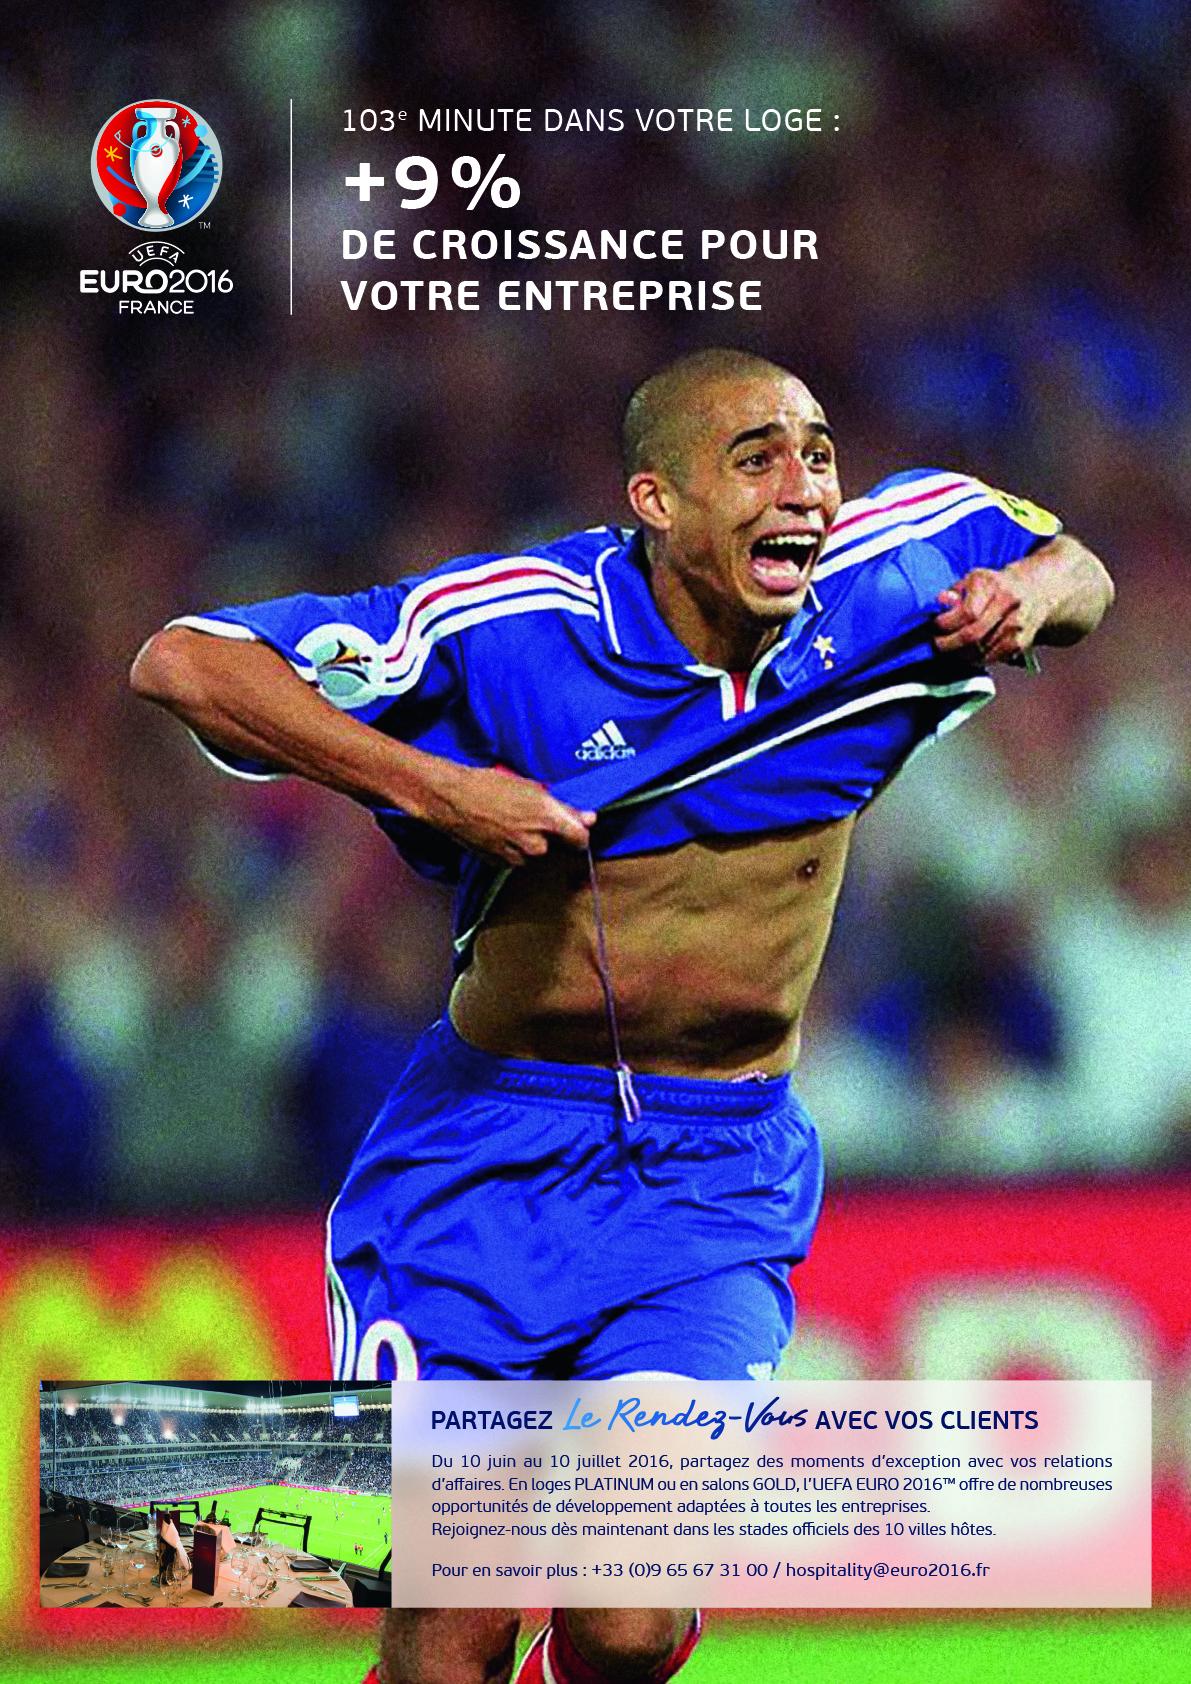 UEFA euro 2016 hospitalité pub trezeguet